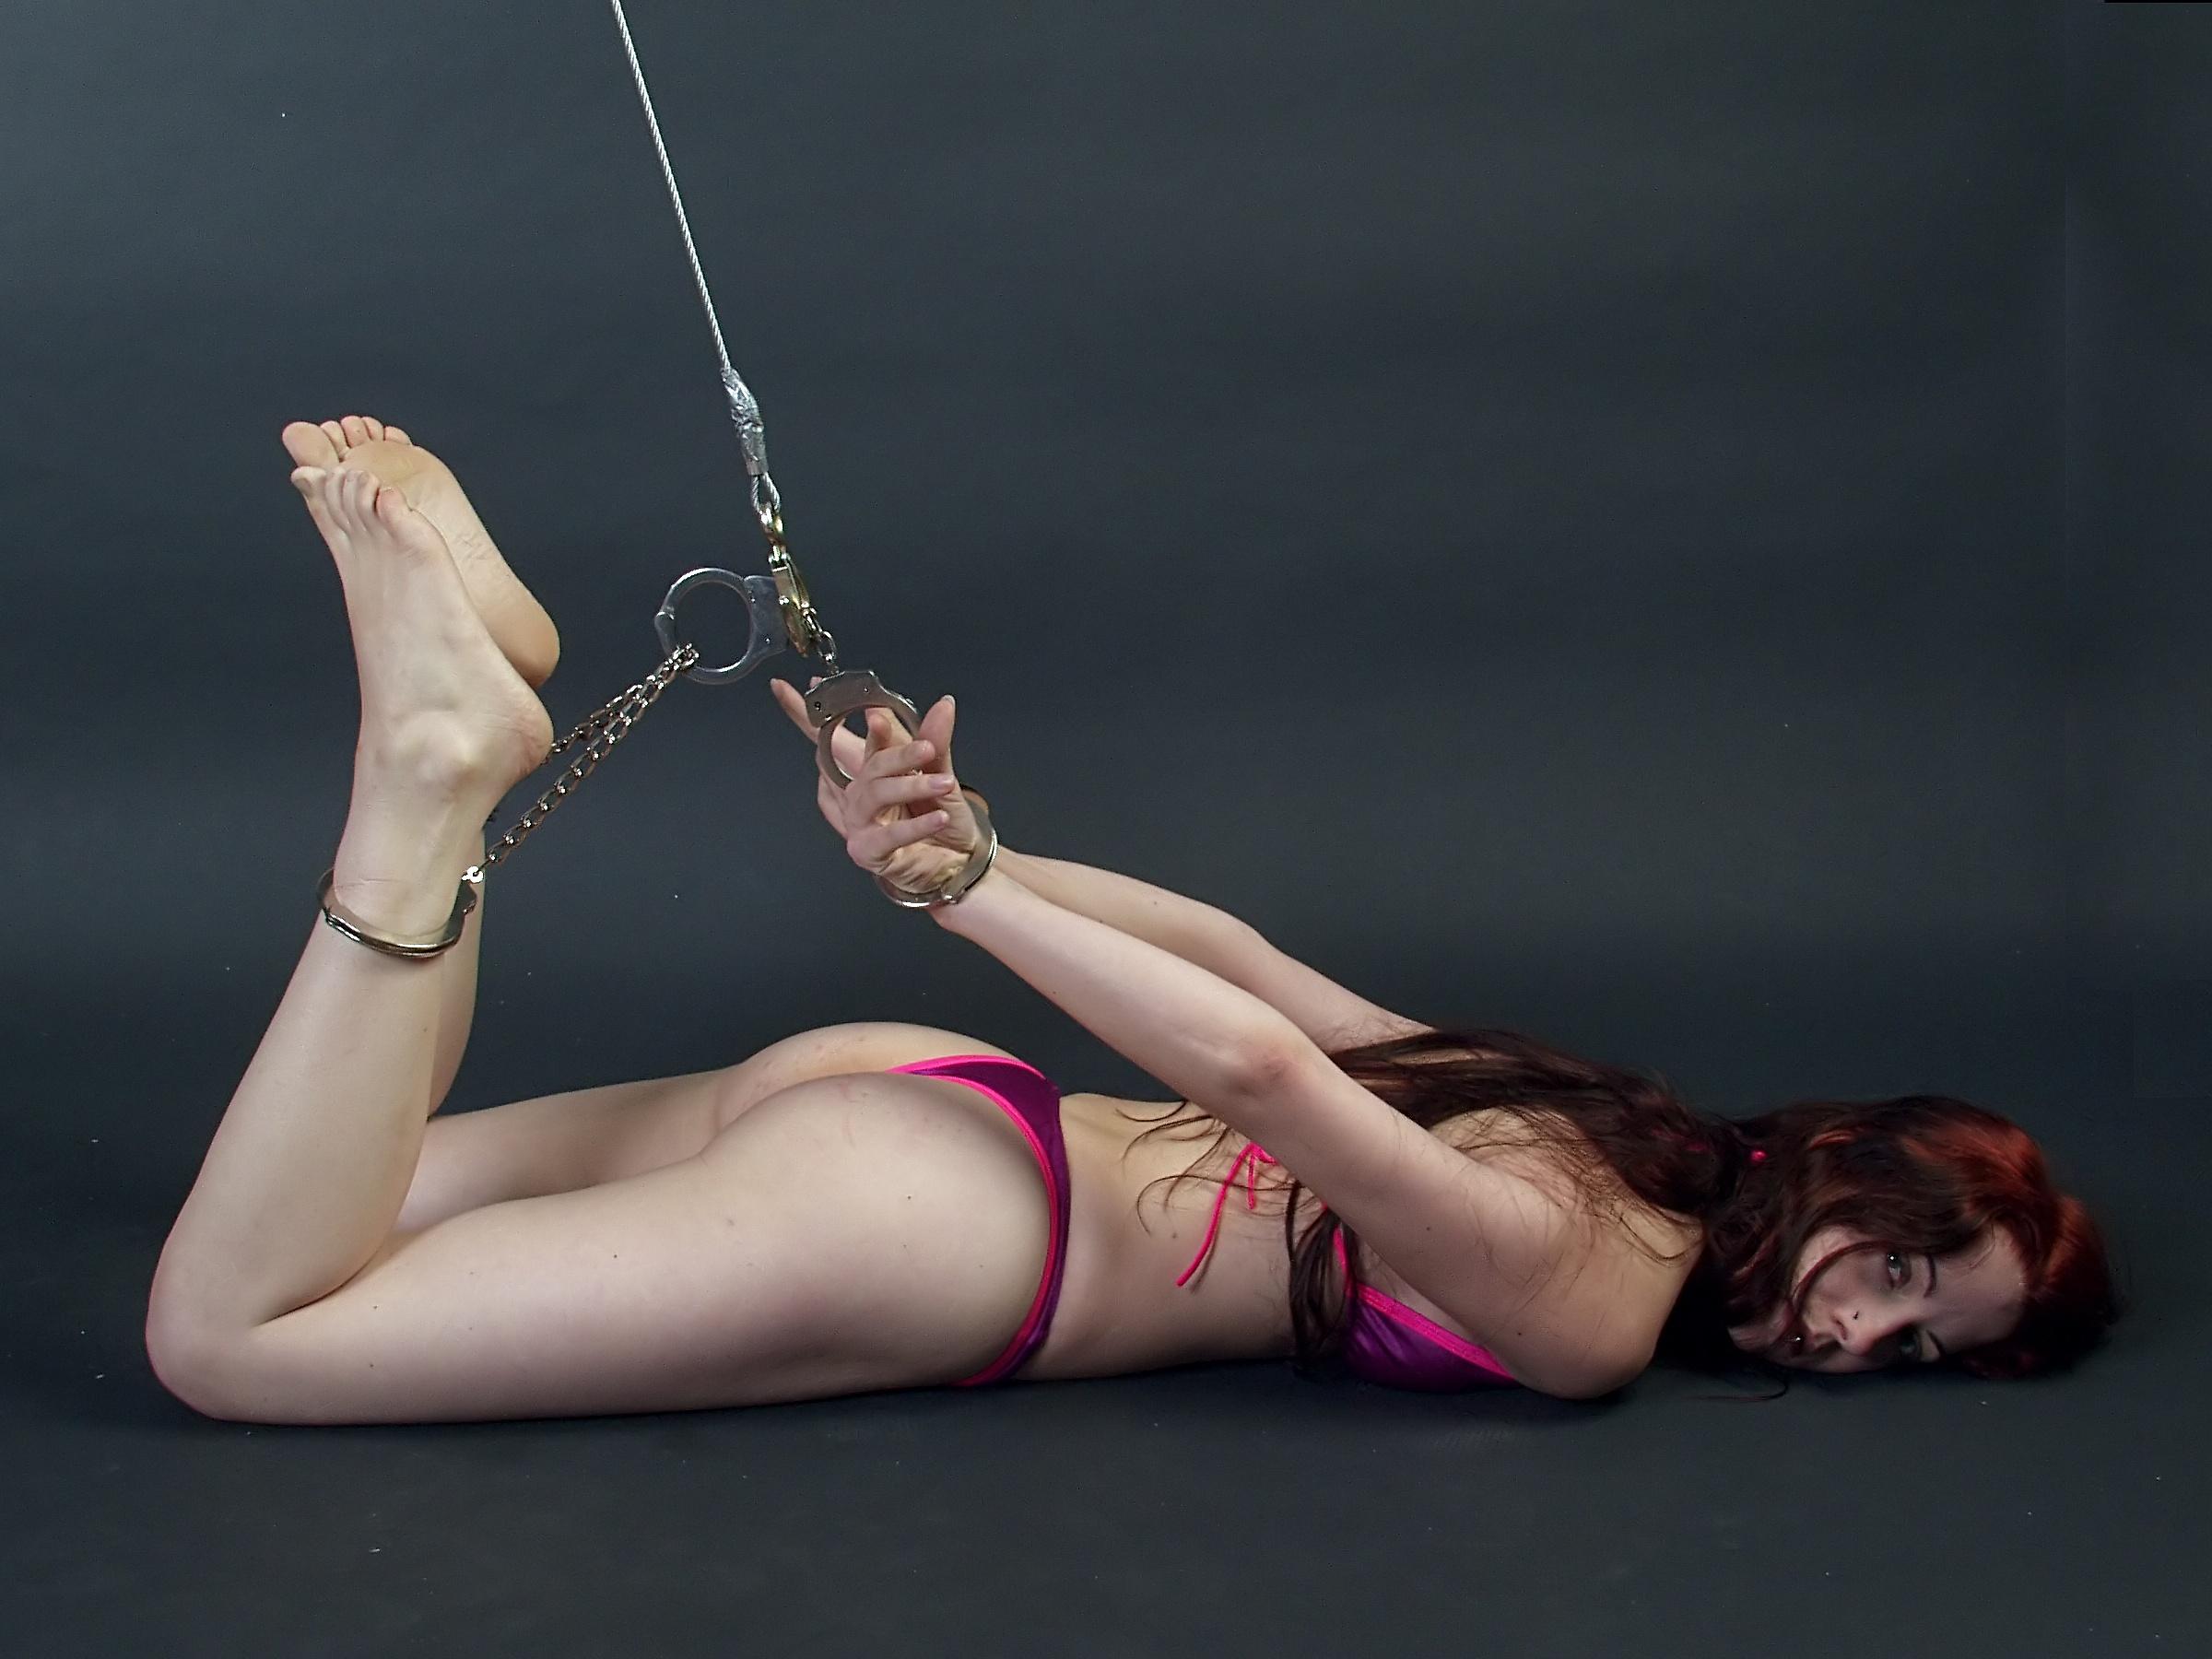 image Ballerina shibari selfbondage and suspension